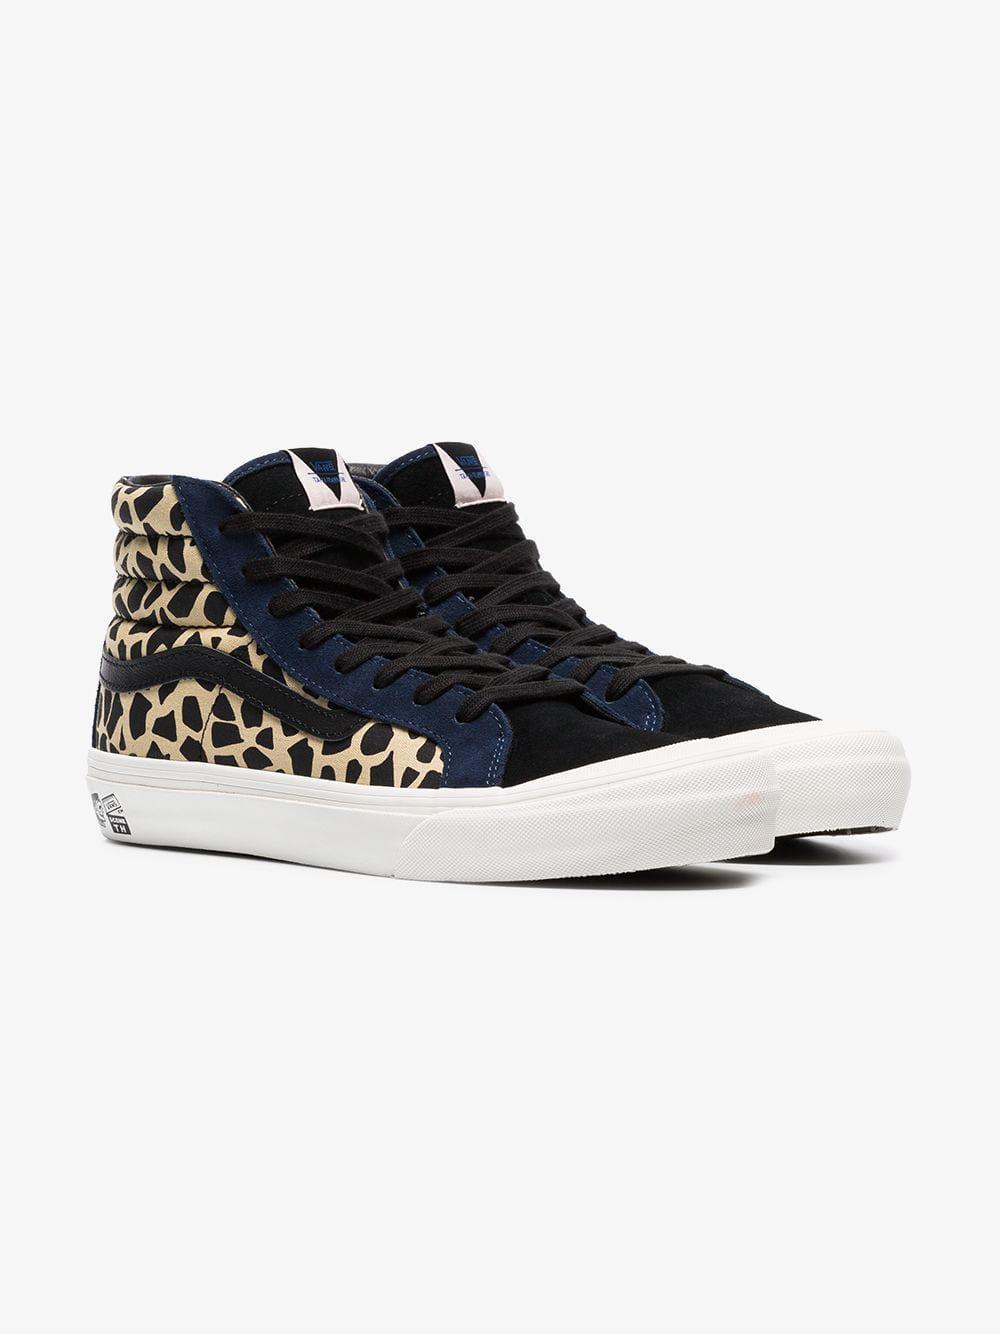 ff3787386b Lyst - Vans Vault Hi-top Sneakers in Brown for Men - Save 3%